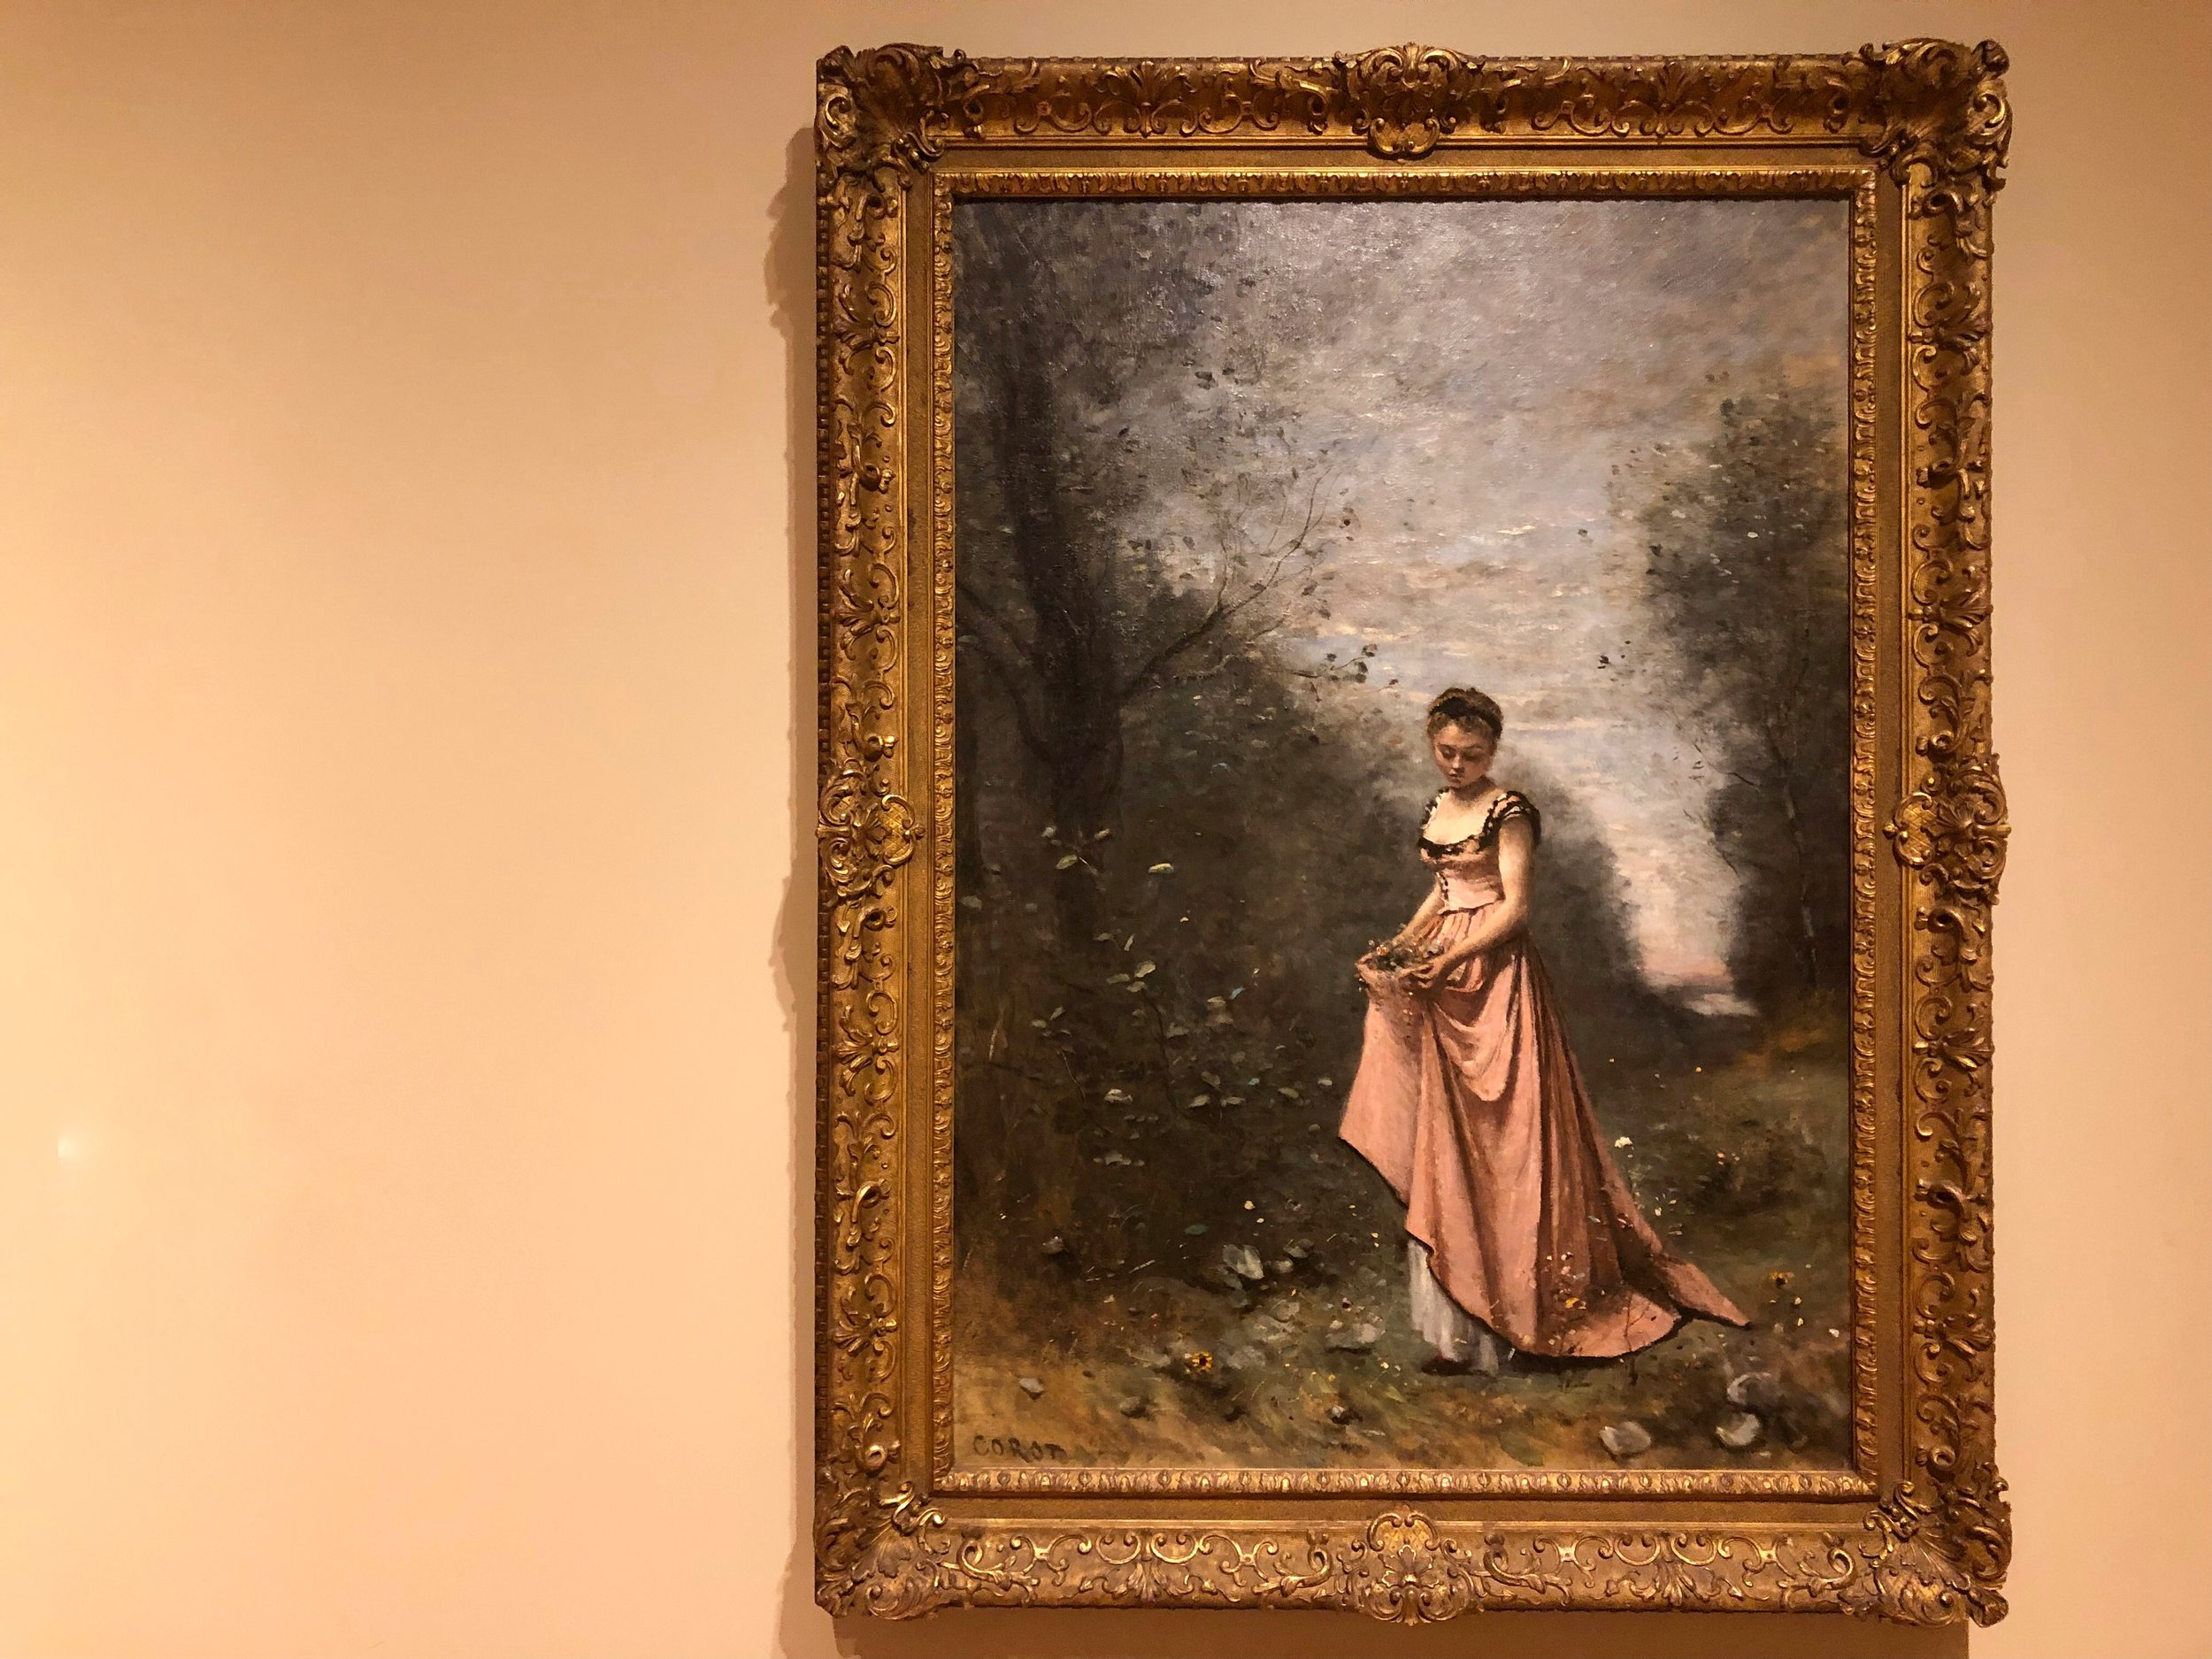 Springtime of Life - Corot